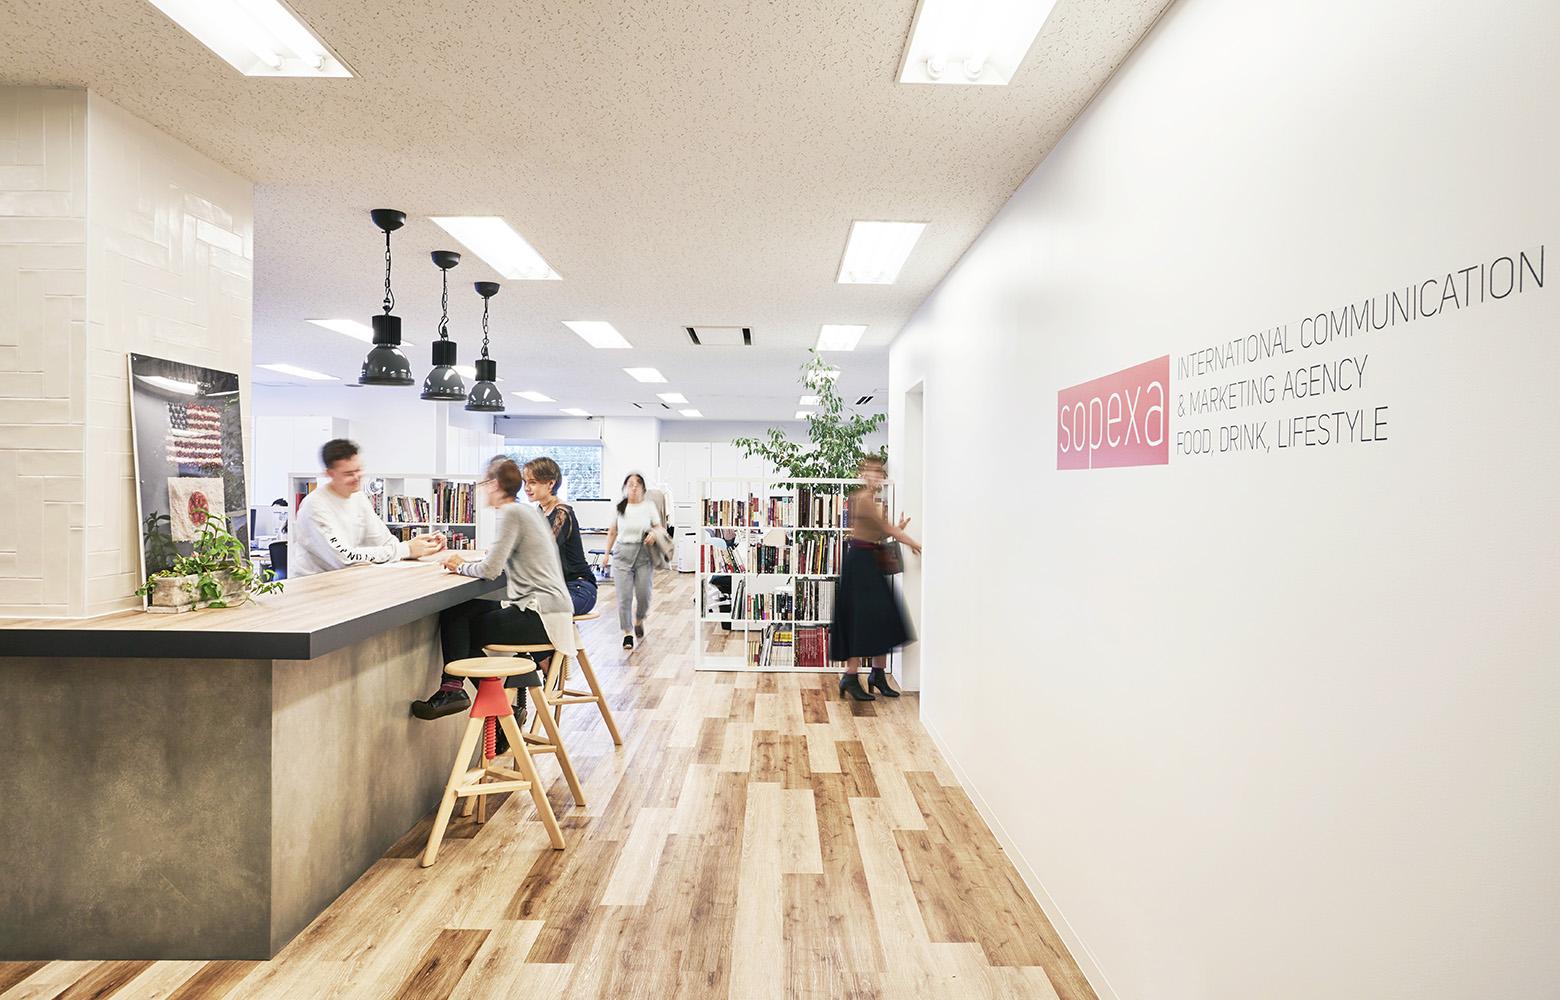 Sopexa Japon 株式会社 Refresh Space_2 デザイン・レイアウト事例